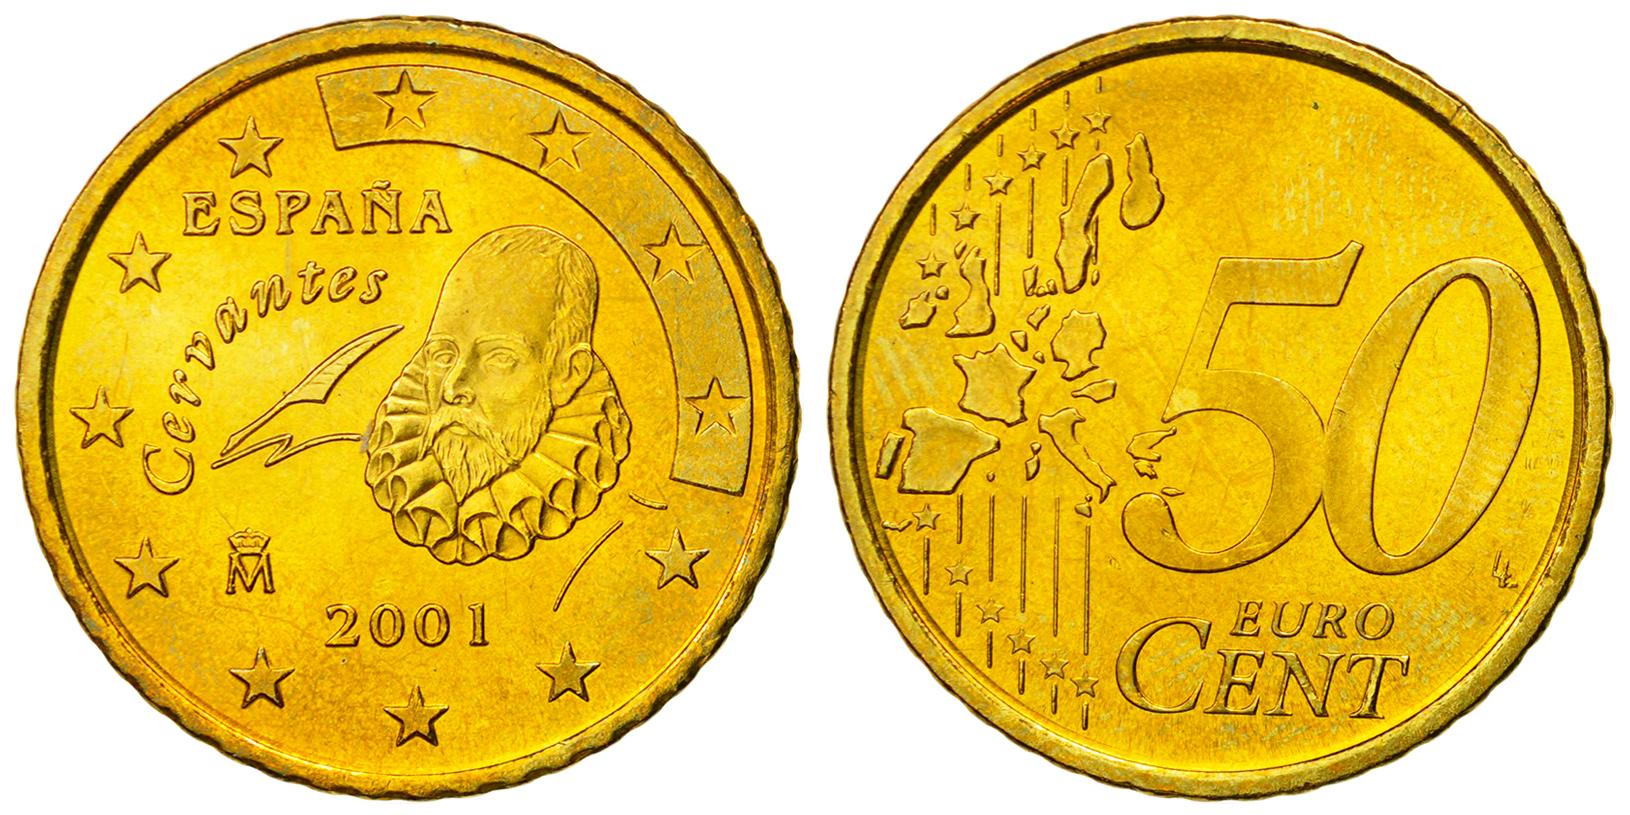 50 یورو سنت خوان کارلوس یکم - میگل د سروانتس